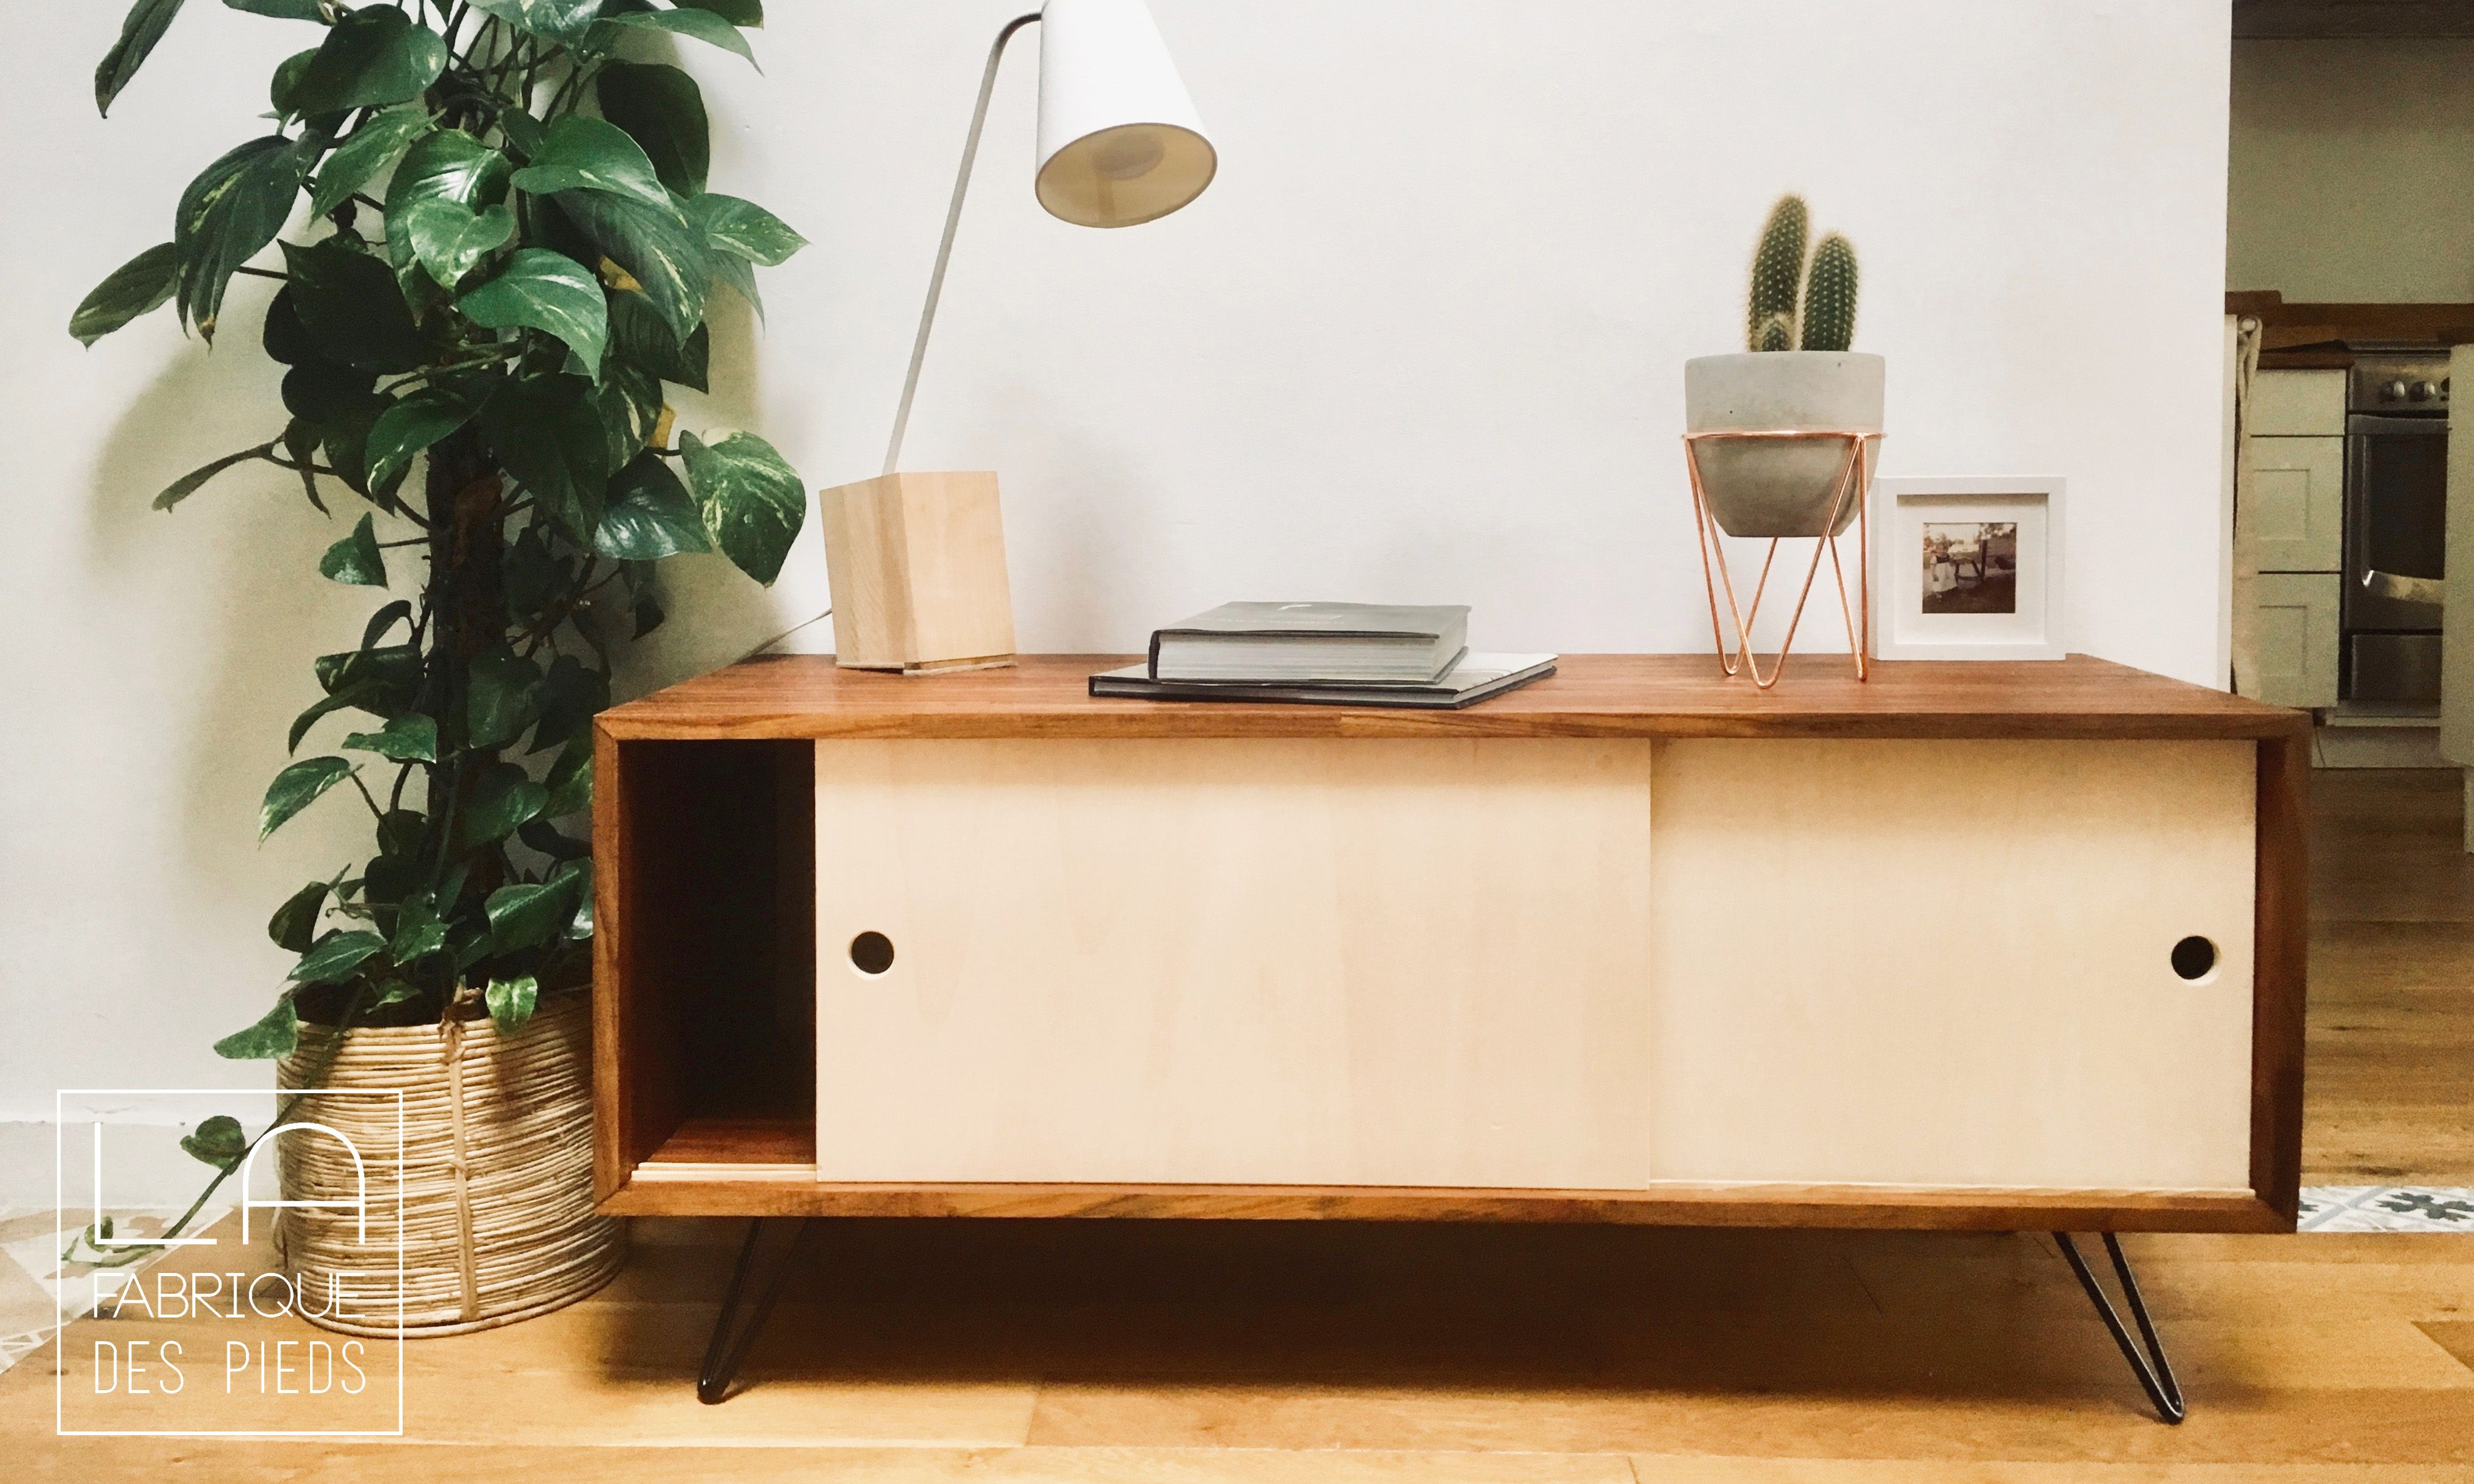 Rehausse Meuble Tv Ikea pied de meuble 15cm – hairpin legs en 2020 | pied meuble